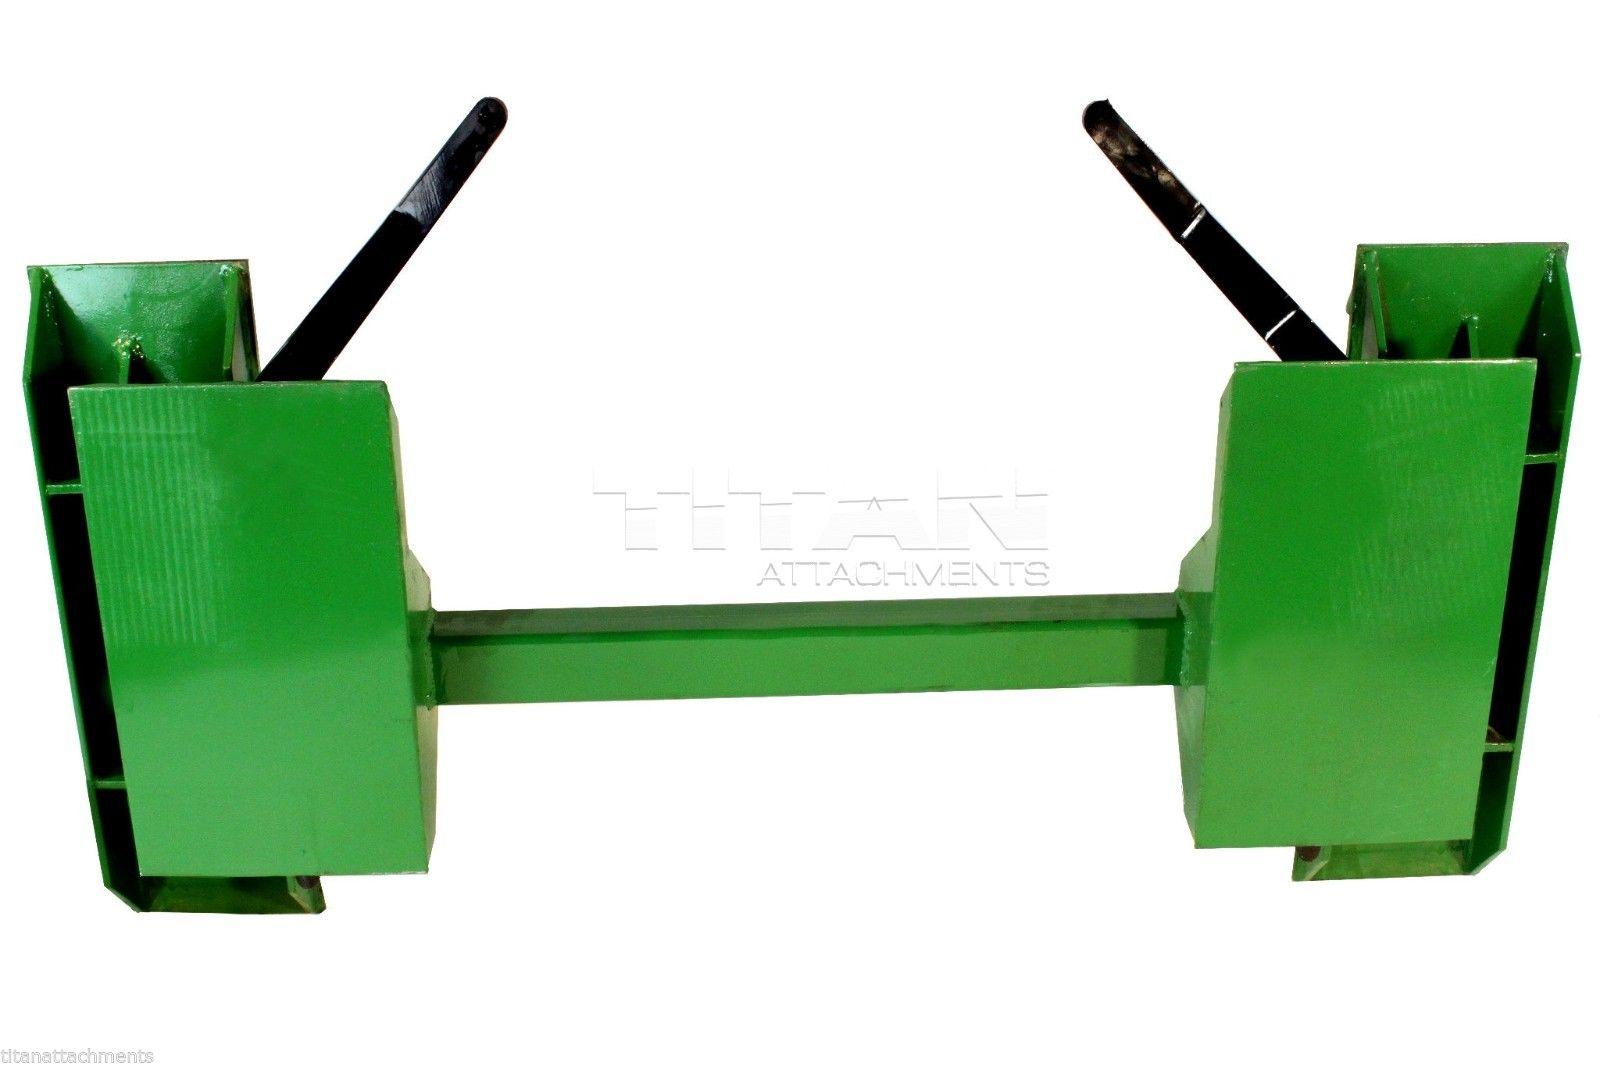 John Deere to Skid Steer Quick Attach Adapter 200 300 400 ...